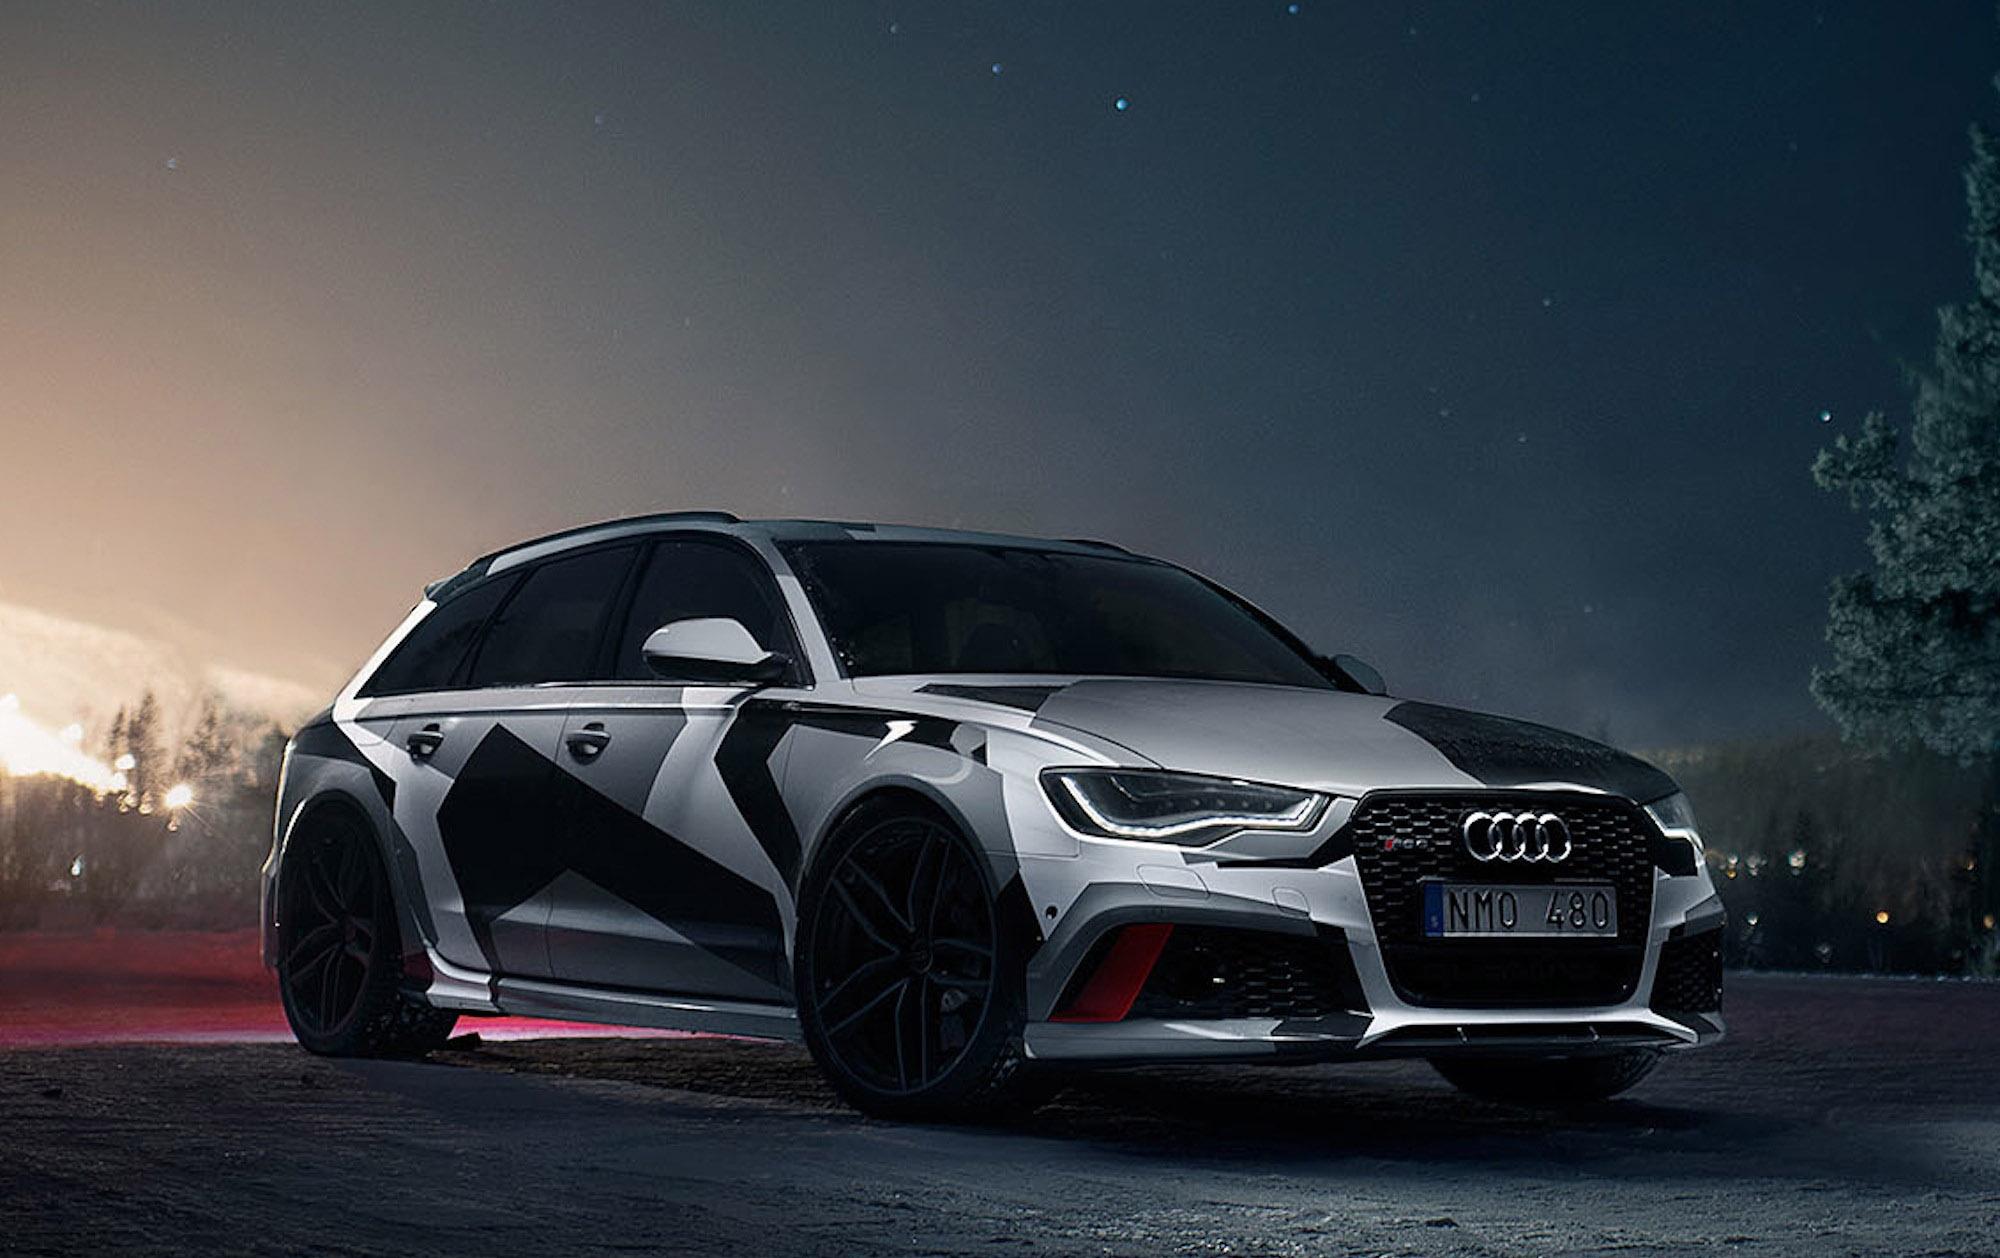 Jon Olsson Reveals His Audi Rs6 Avant